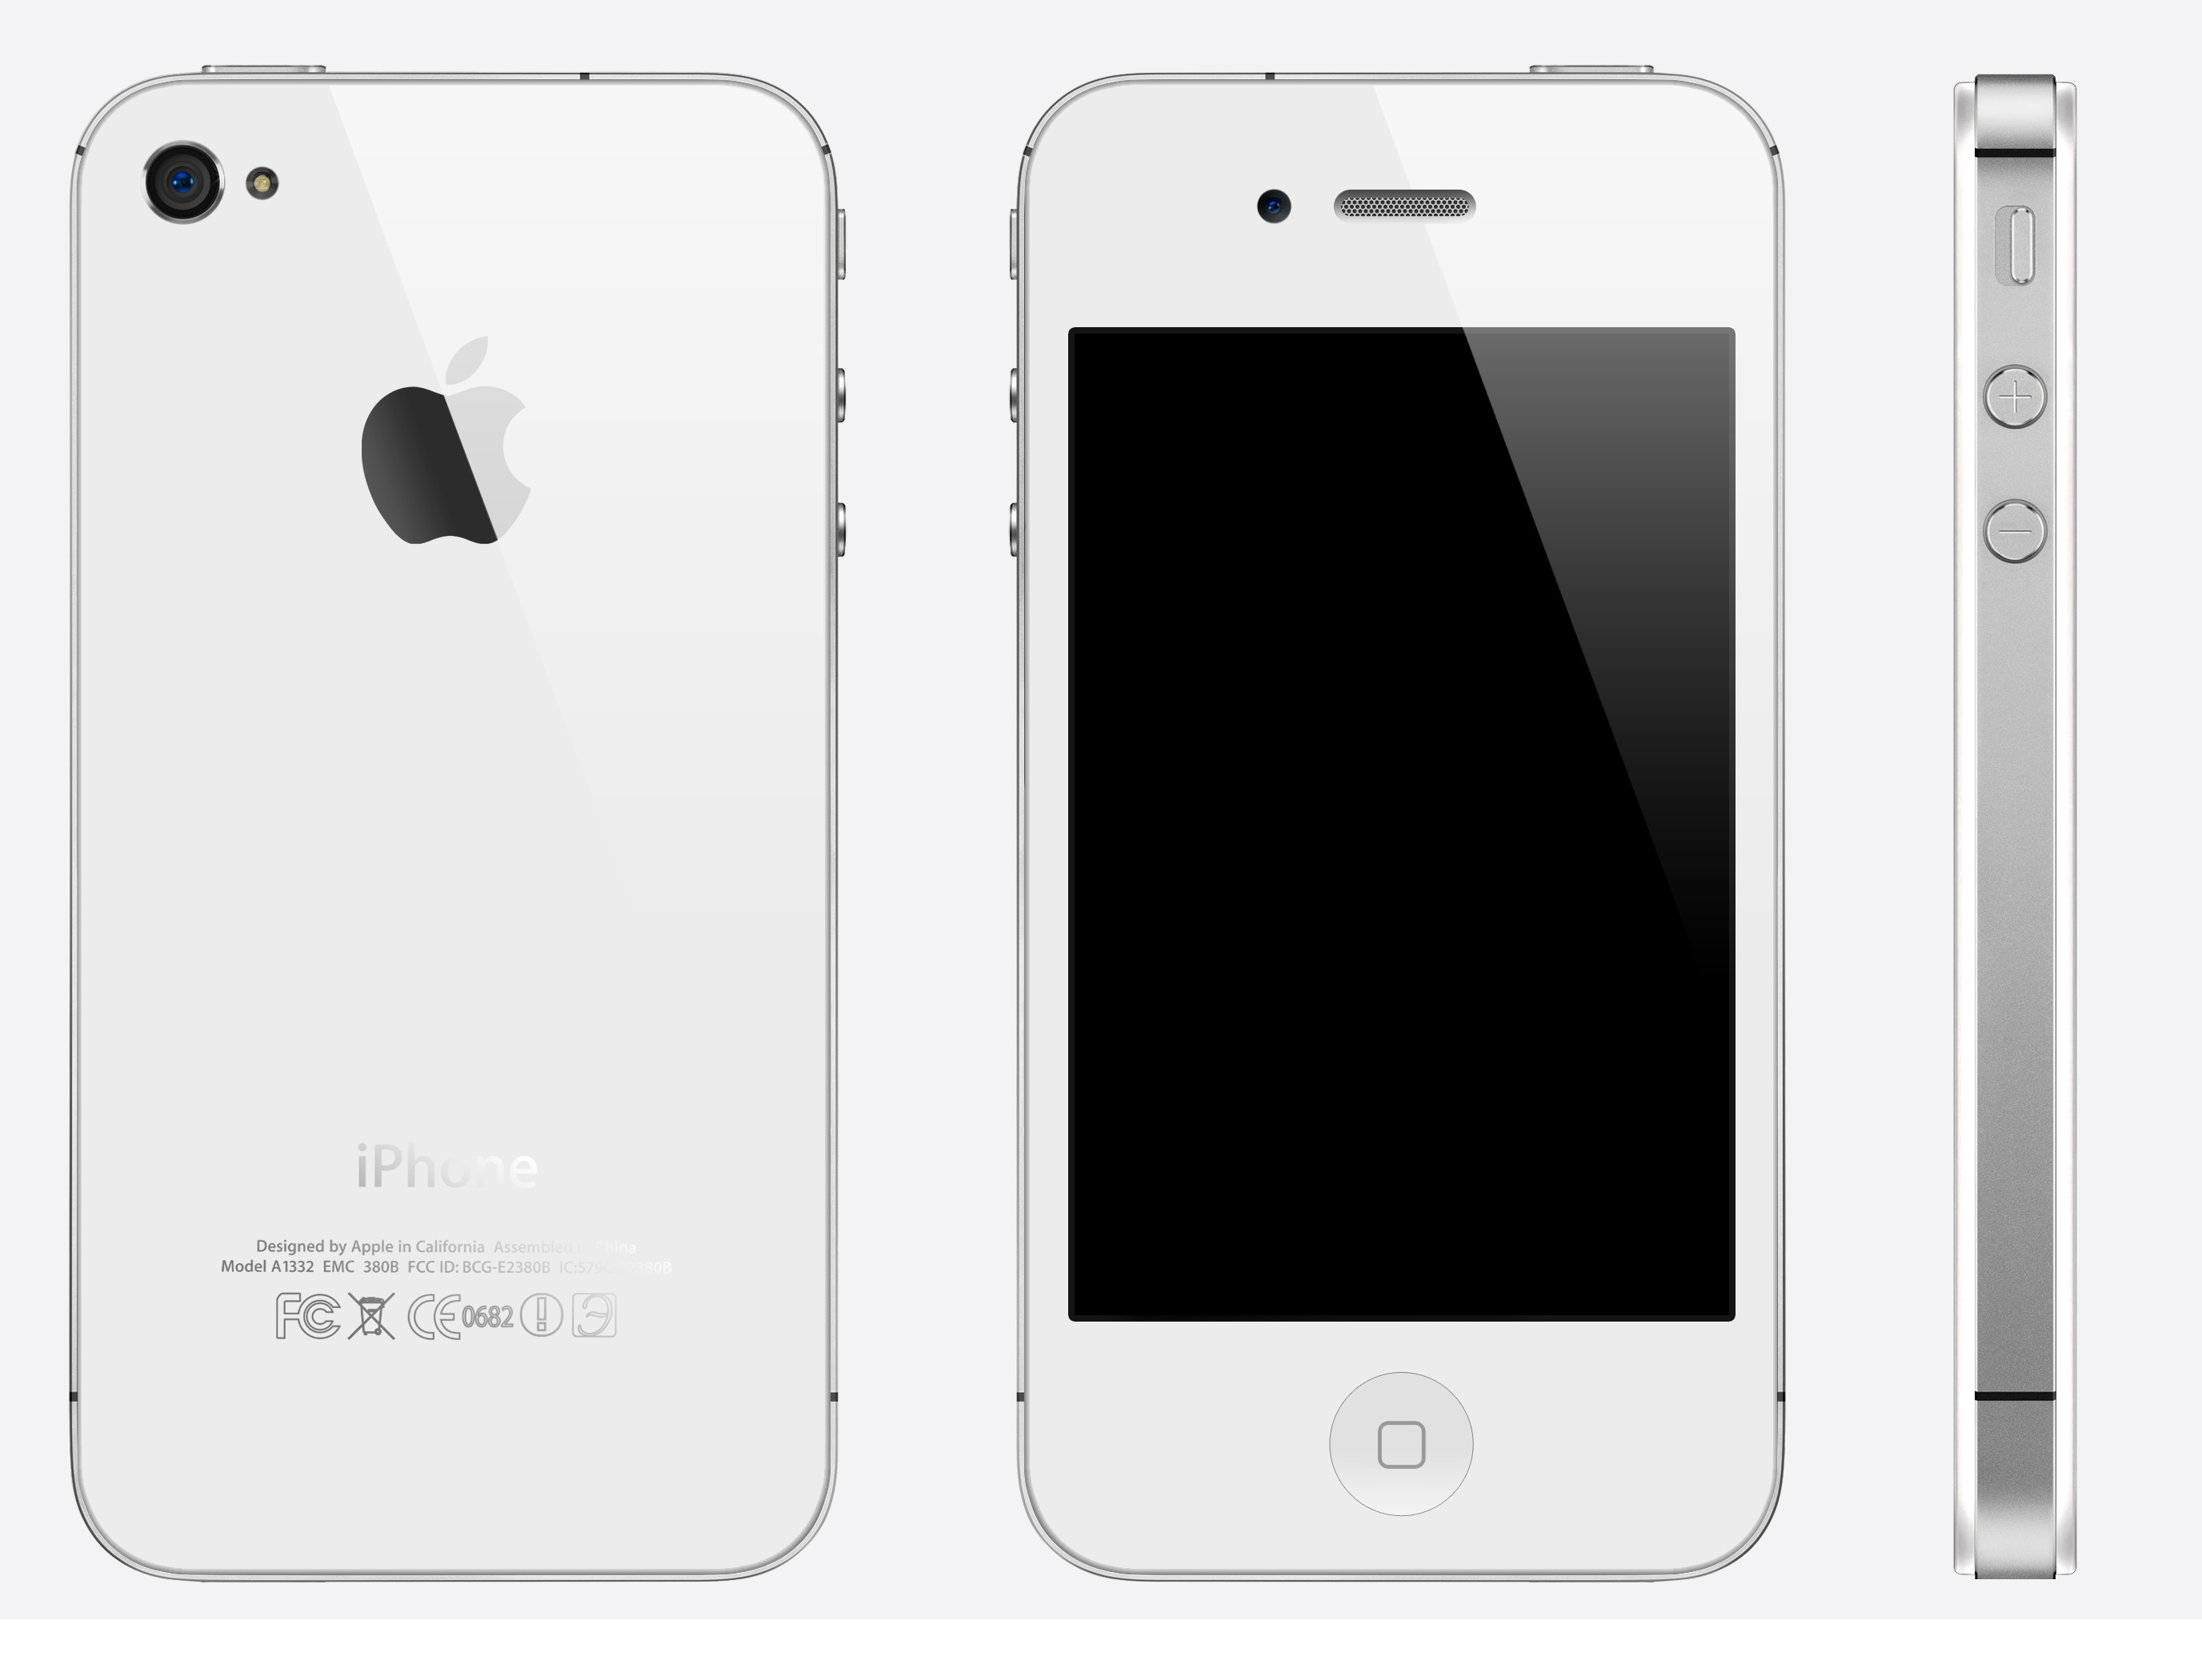 iphone 4s factory unlocked black friday deals